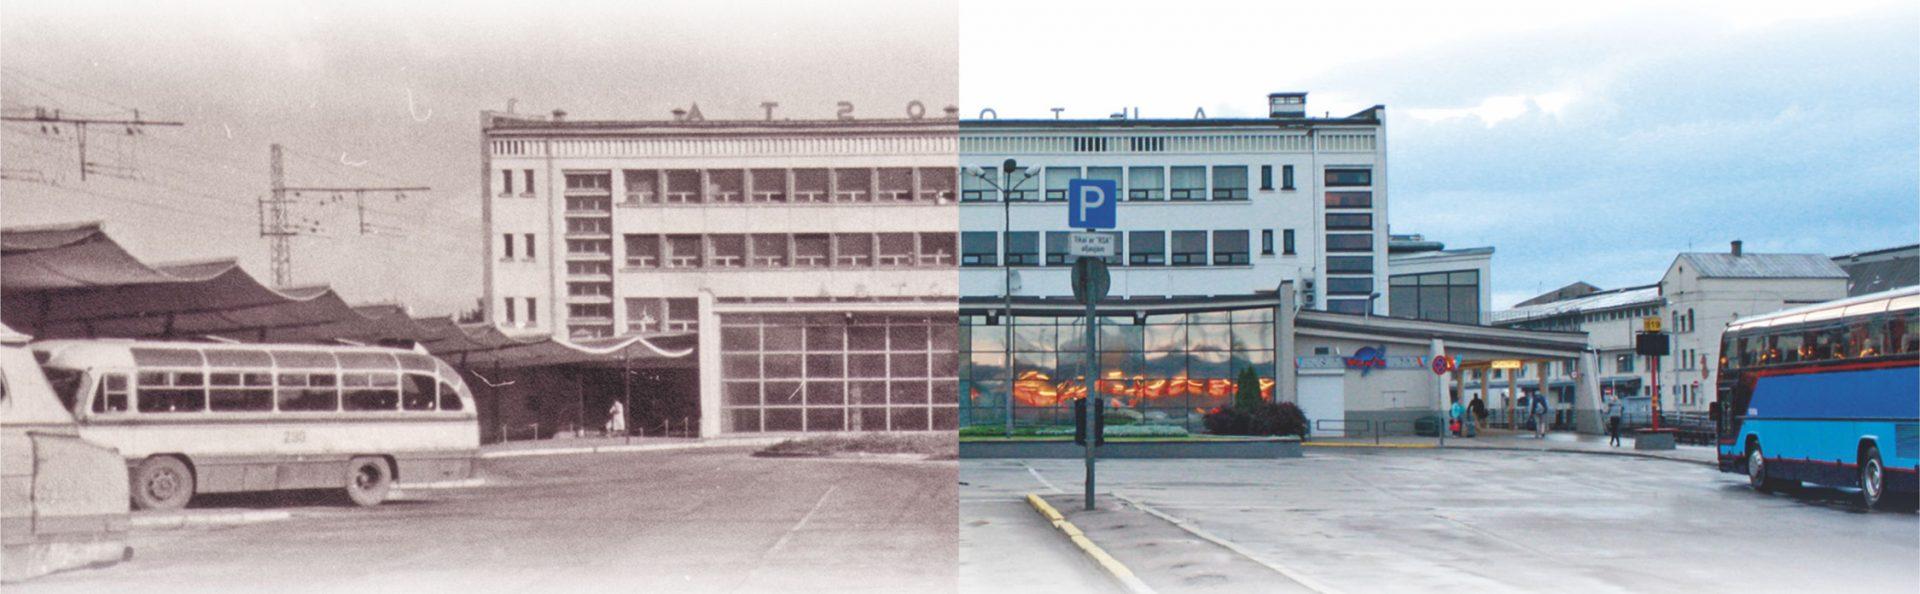 Autoostas vēstures bilde